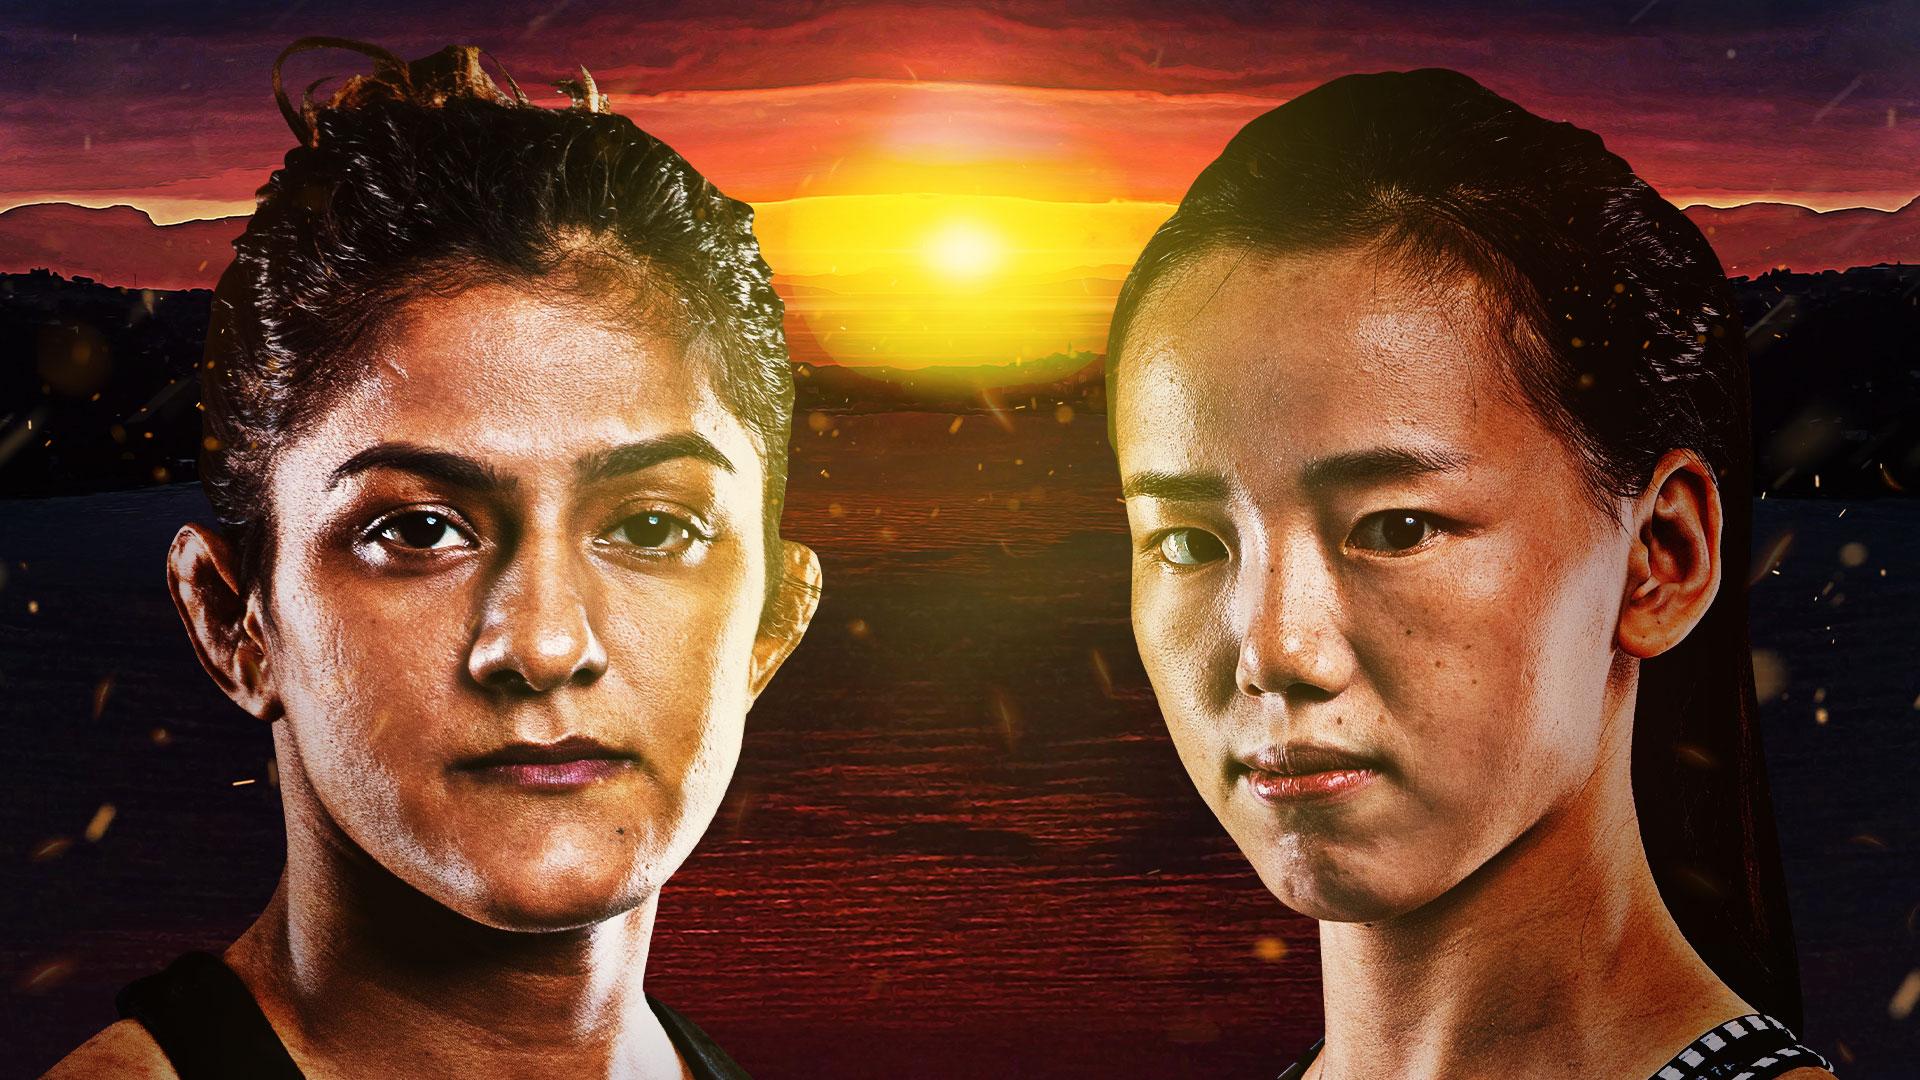 Ritu Phogat and Lin Heqin meet at ONE: BATTLEGROUND on 30 July